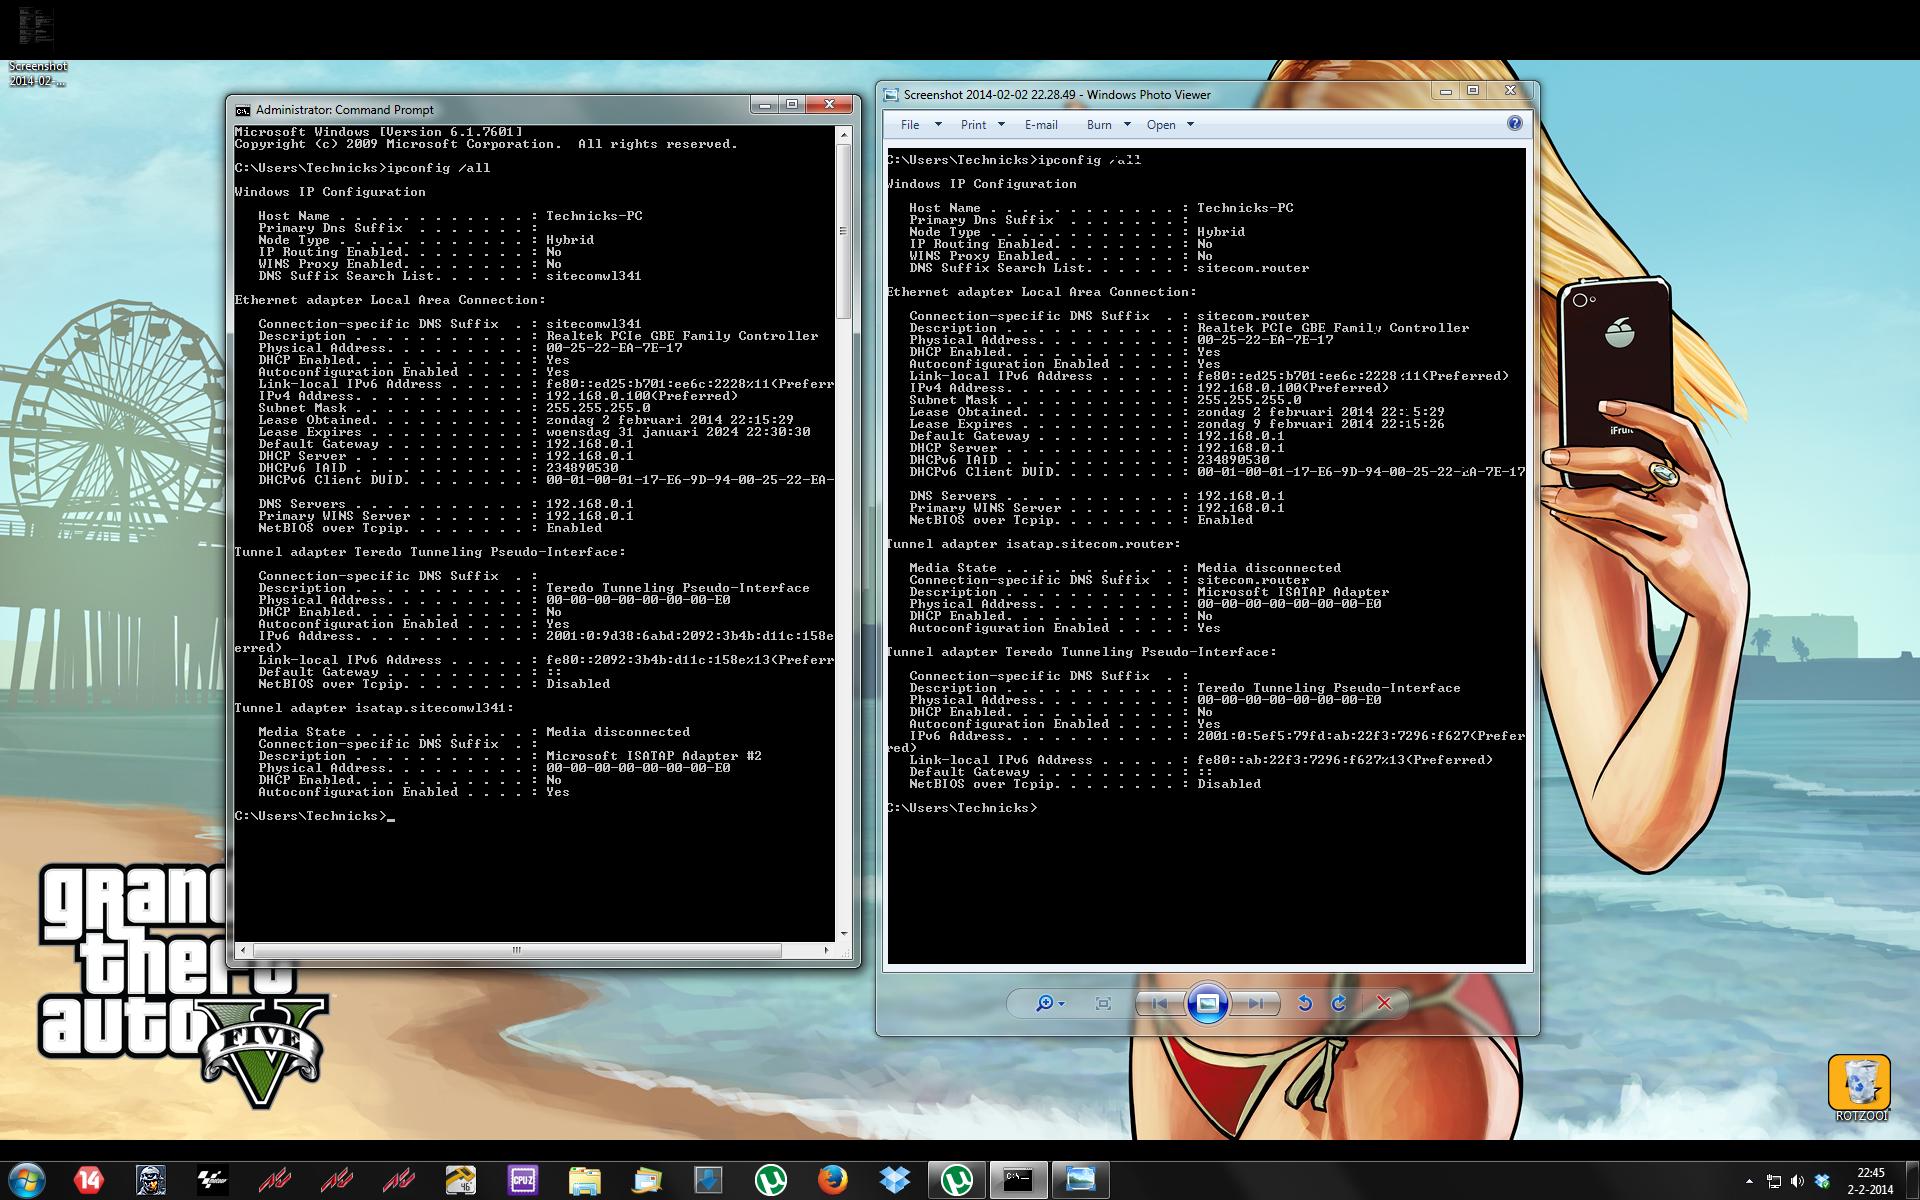 Screenshot 2014-02-02 22.45.30.png